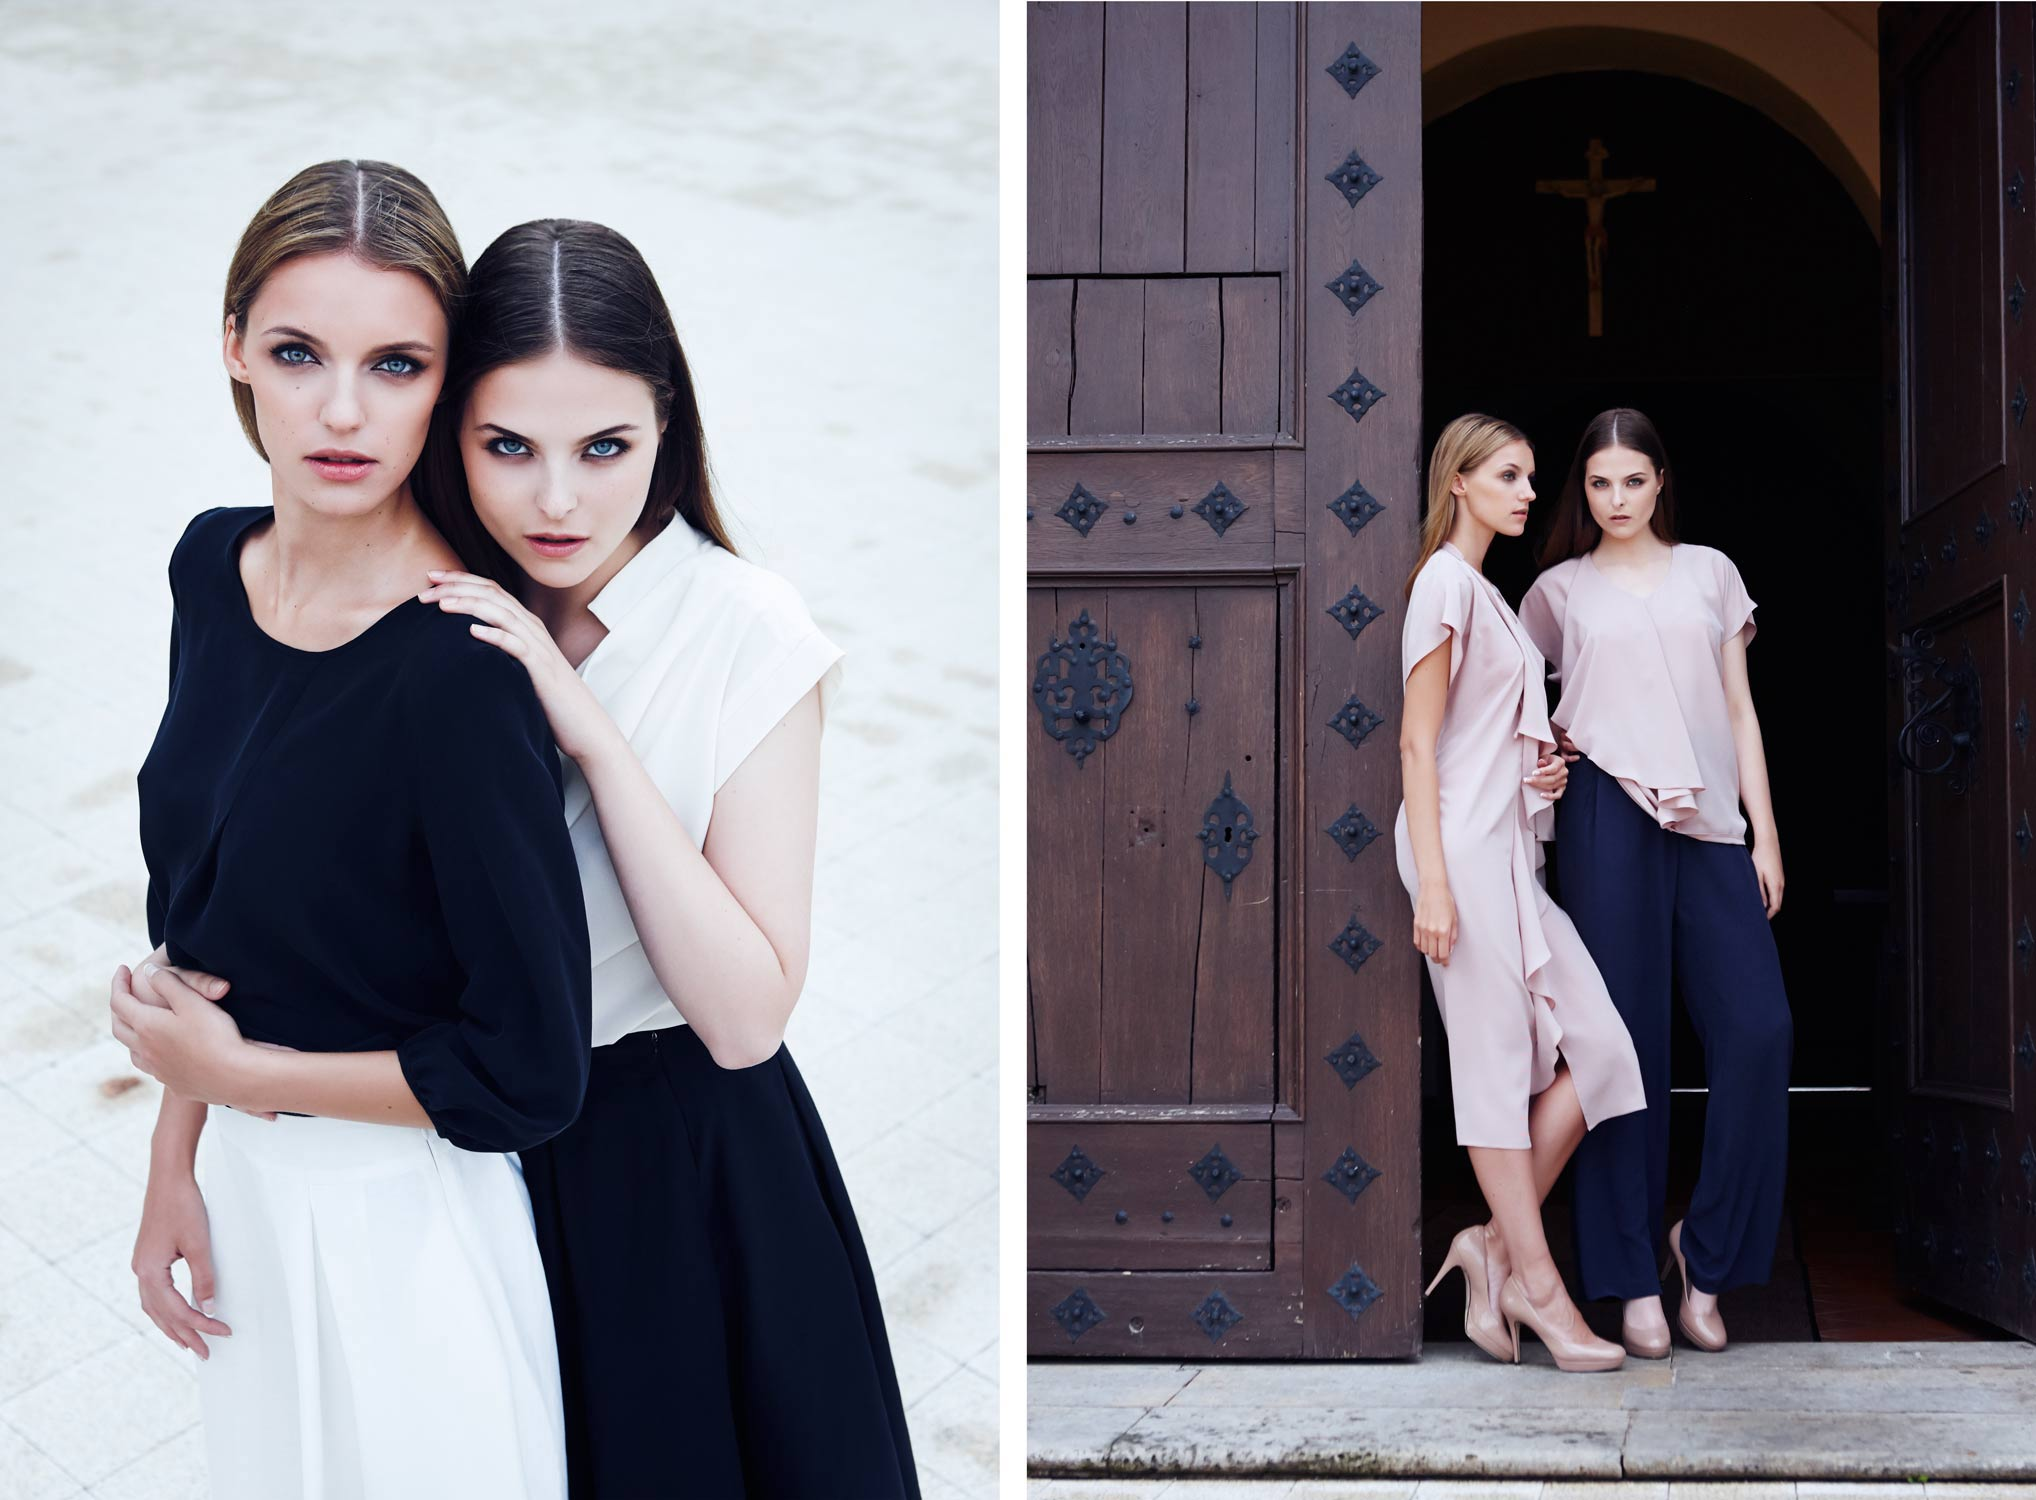 <p>LOULU ET TU<br /> Summer campaign<br /> Diana Balaisytė<br /> Urtė Tomkevičiūtė<br /> Lithuania<br /> 2014</p>